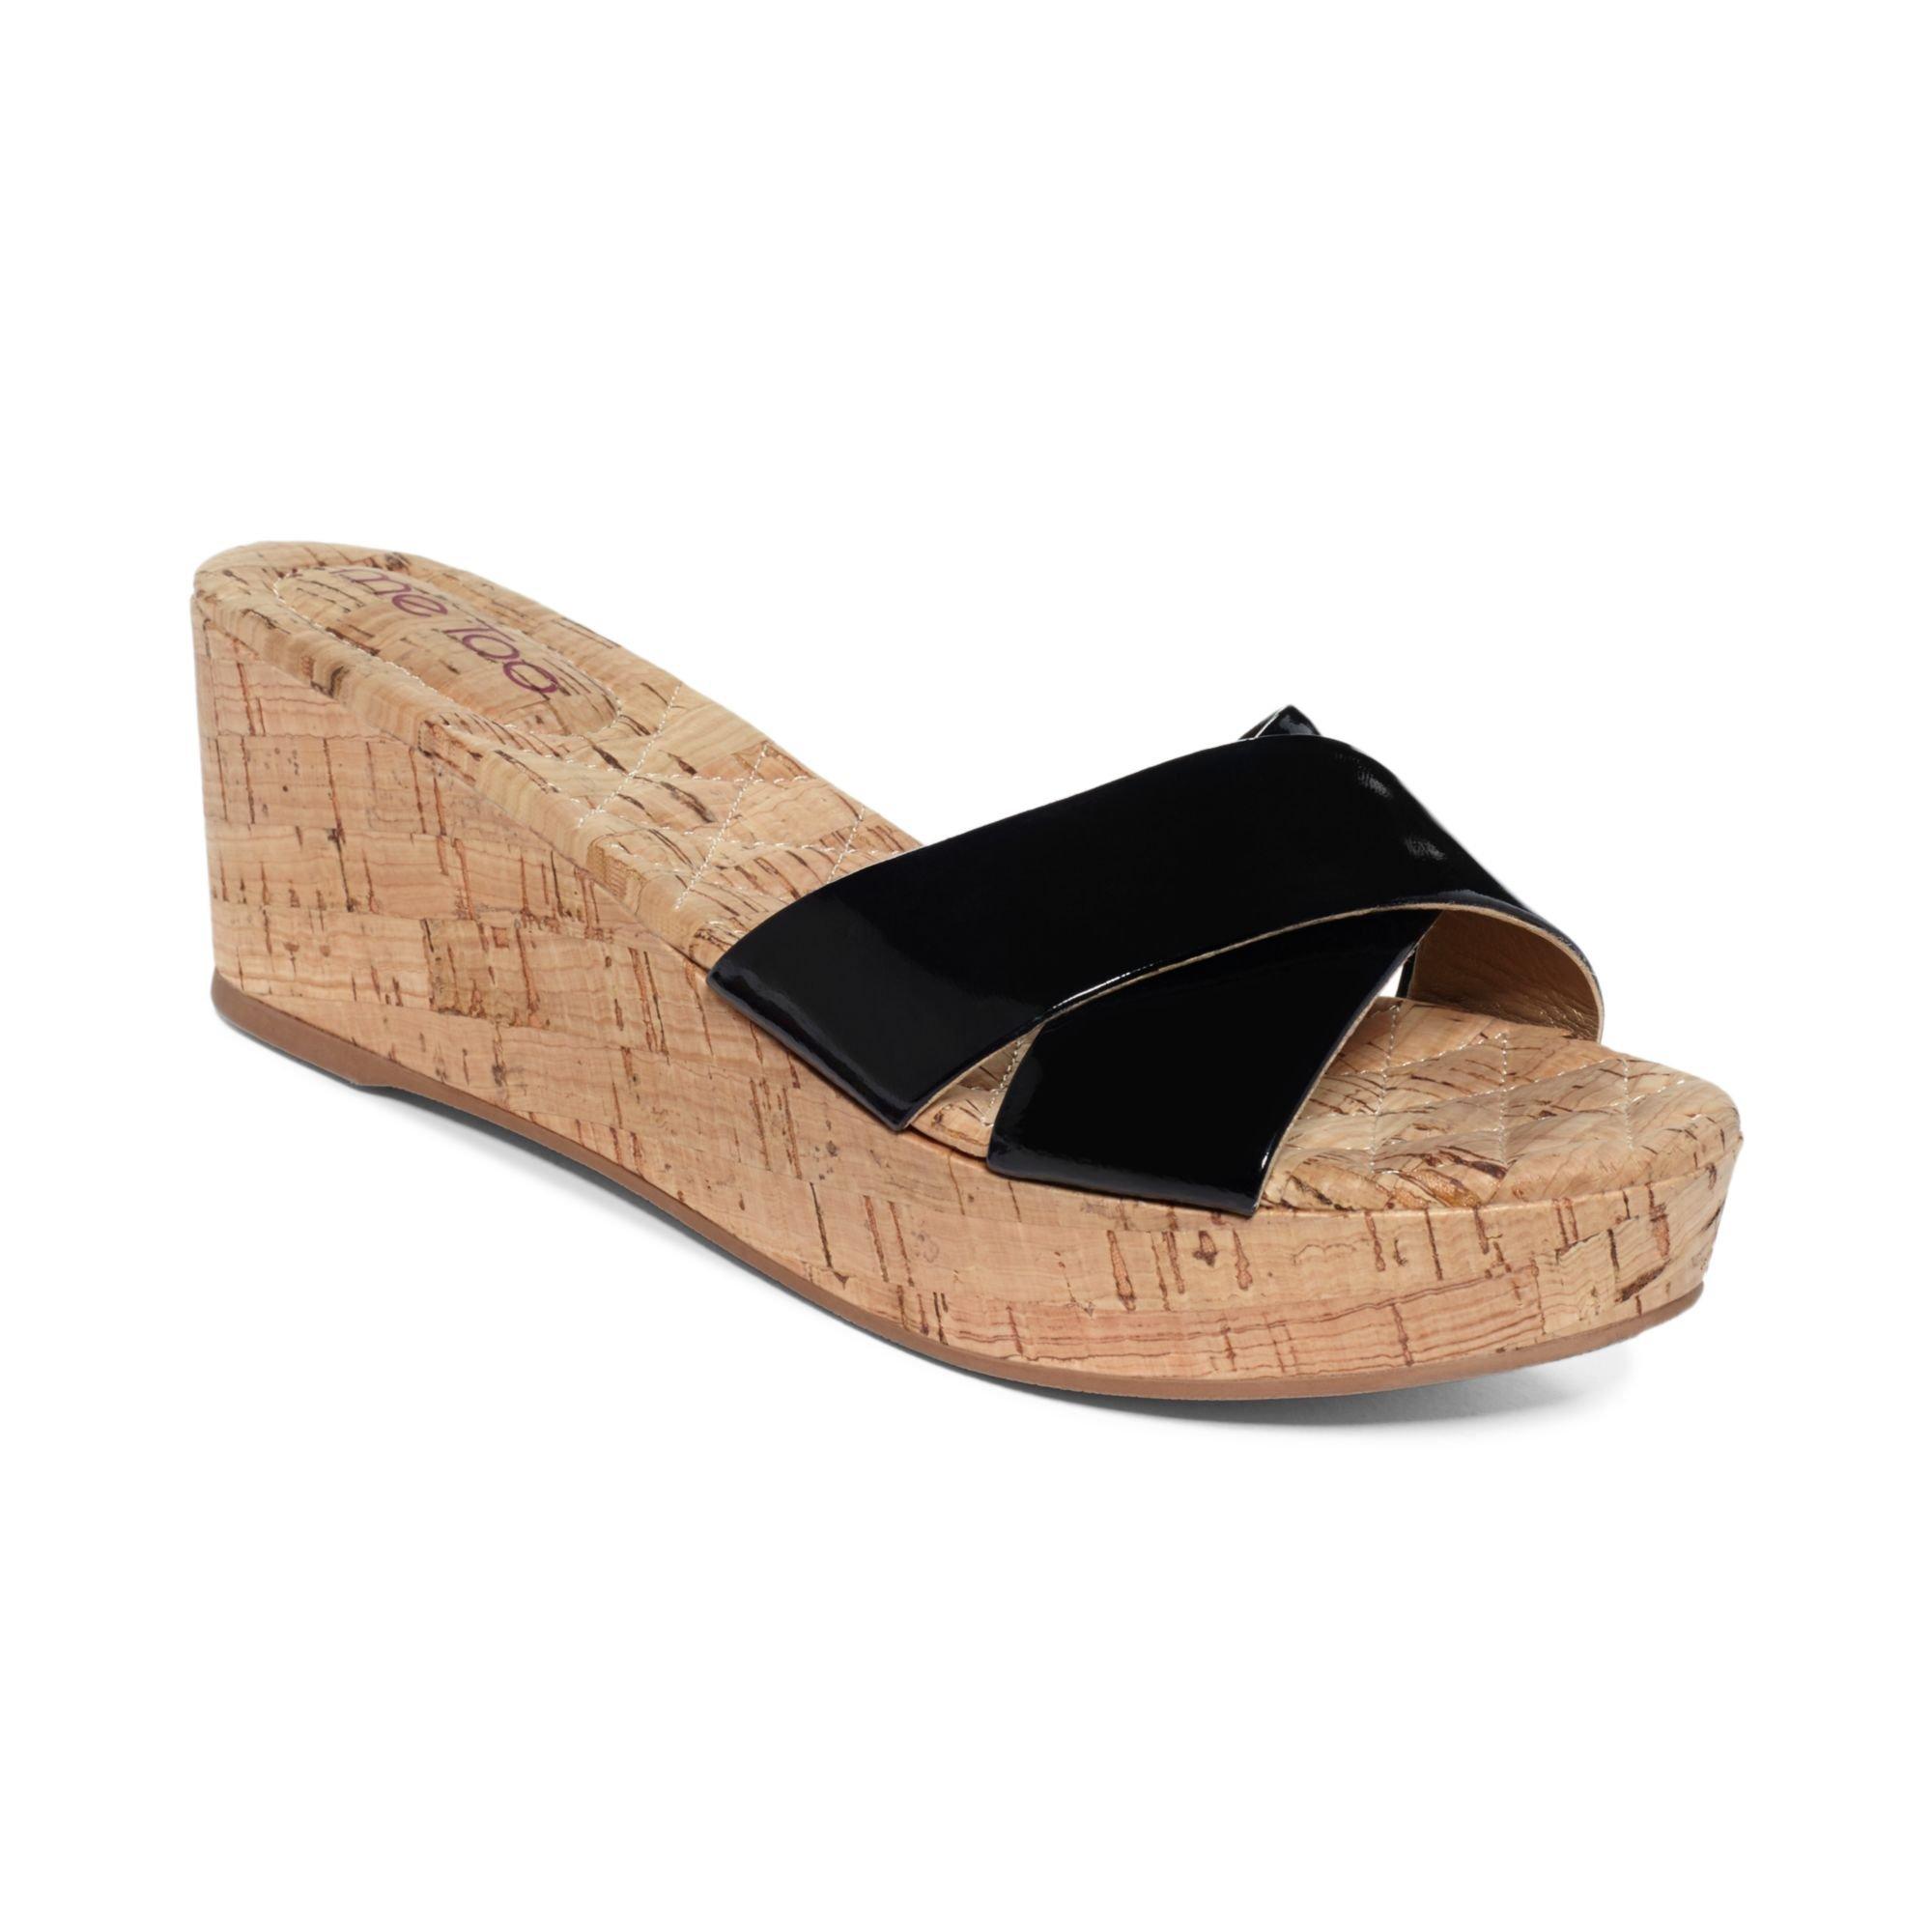 me nila platform wedge sandals in black lyst